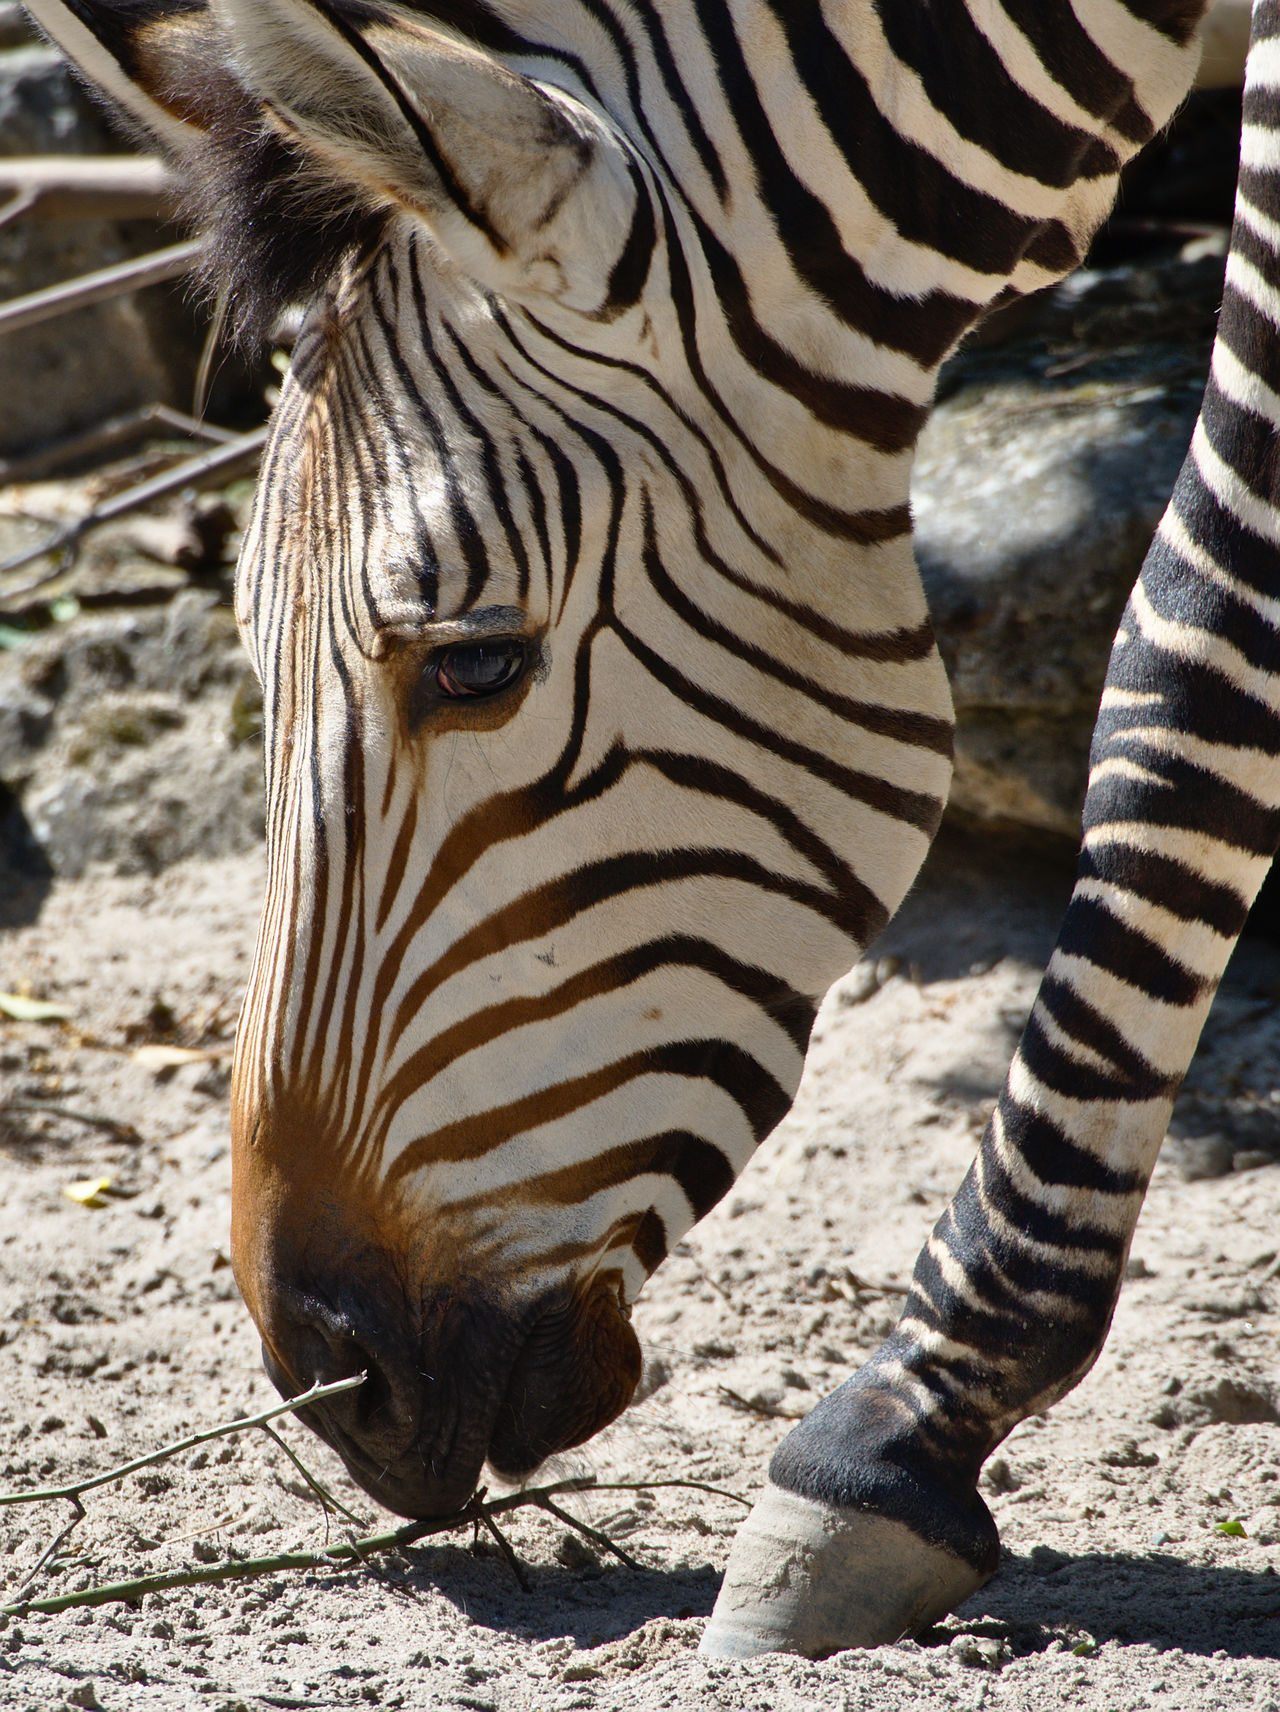 20190613_Zoo_Landau_034